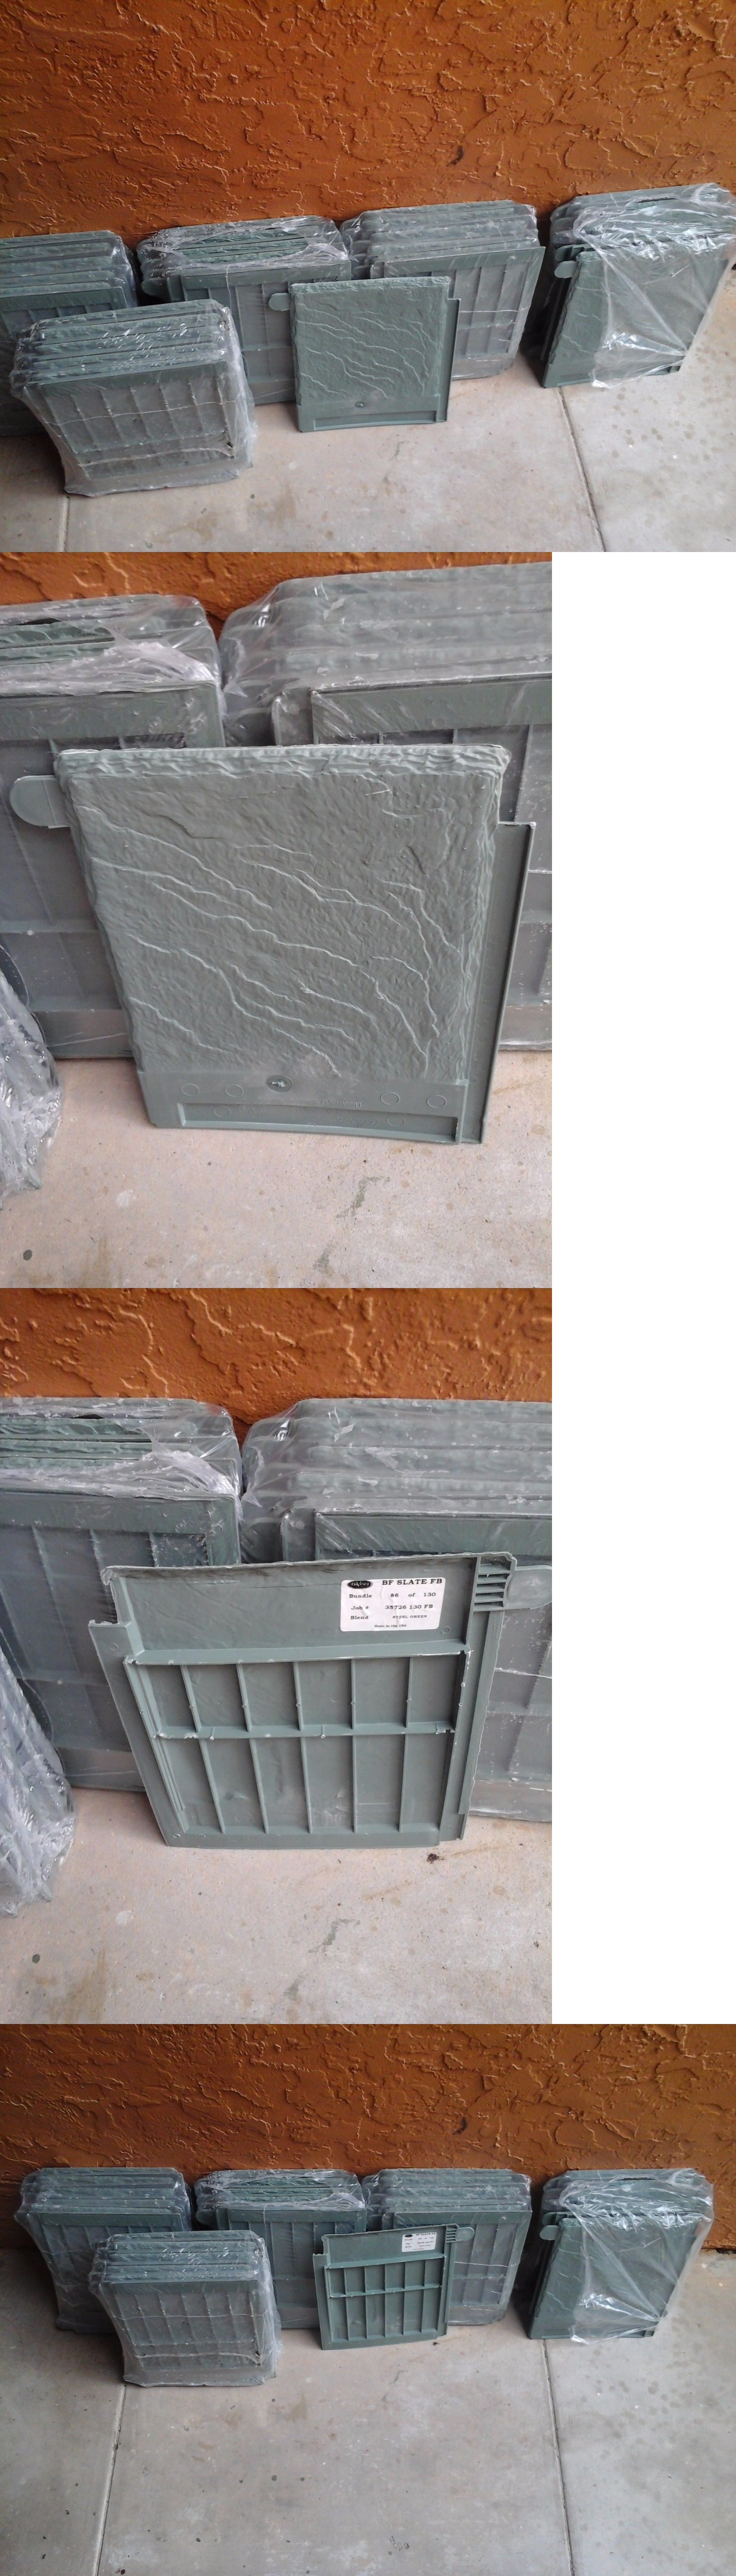 Davinci Bellaforte Synthetic Slate Roof Tiles Steel Green 5 Packs 10 50 Sq Ft Synthetic Slate Roofing Slate Roof Tiles Synthetic Slate